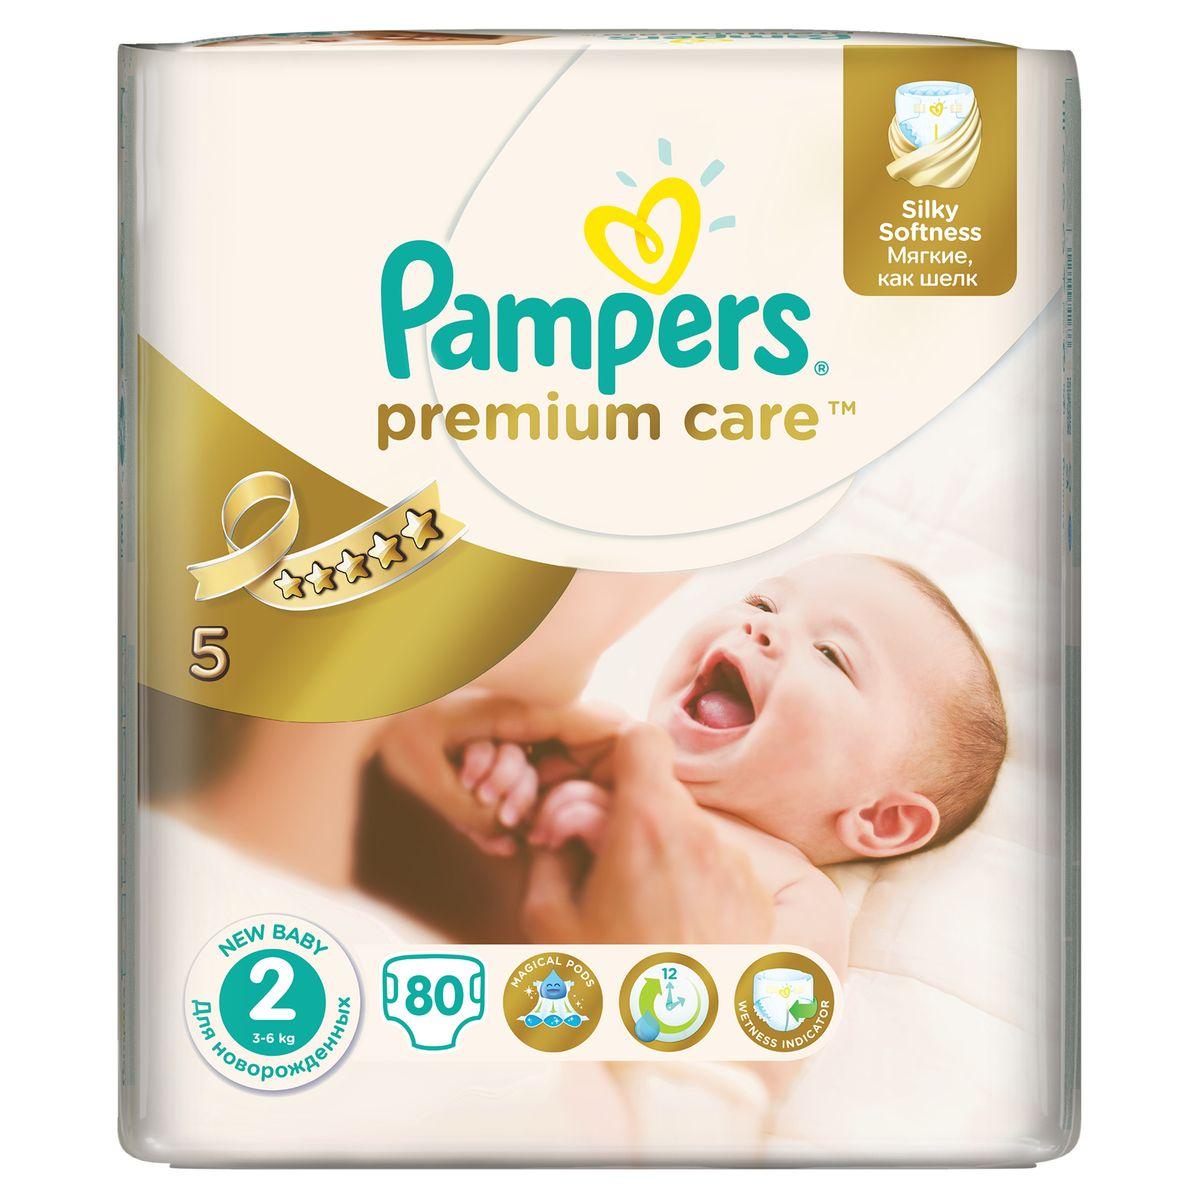 Pampers Подгузники Premium Care 3-6 кг размер 2 80 шт81532776